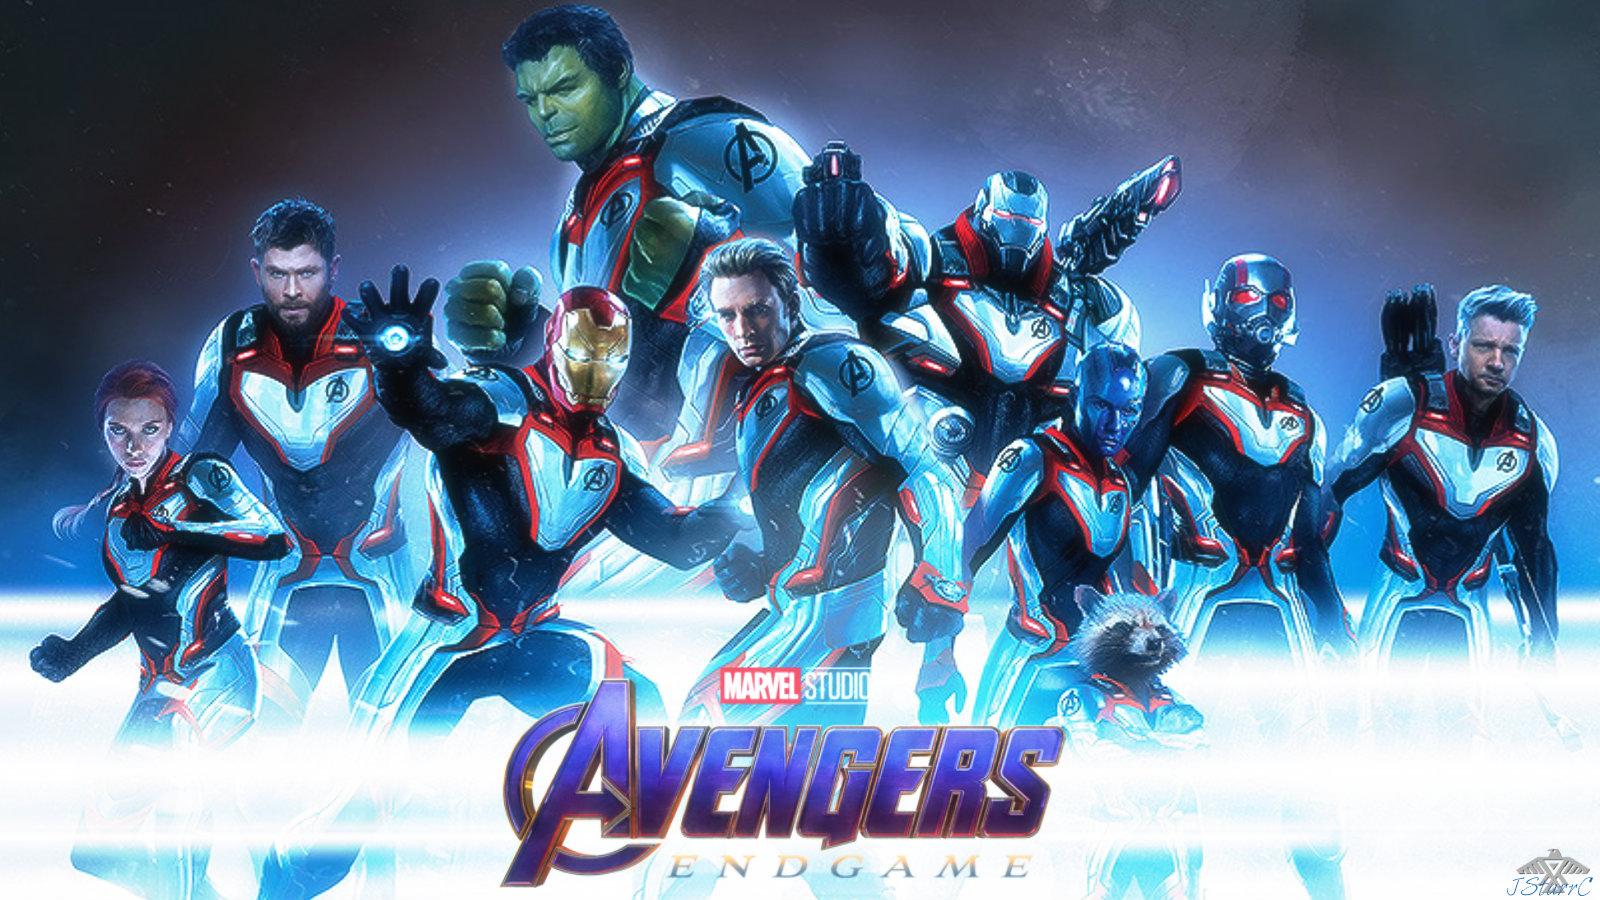 Avengers Endgame 2019 The Avengers Wallpaper 42730728 Fanpop Page 9